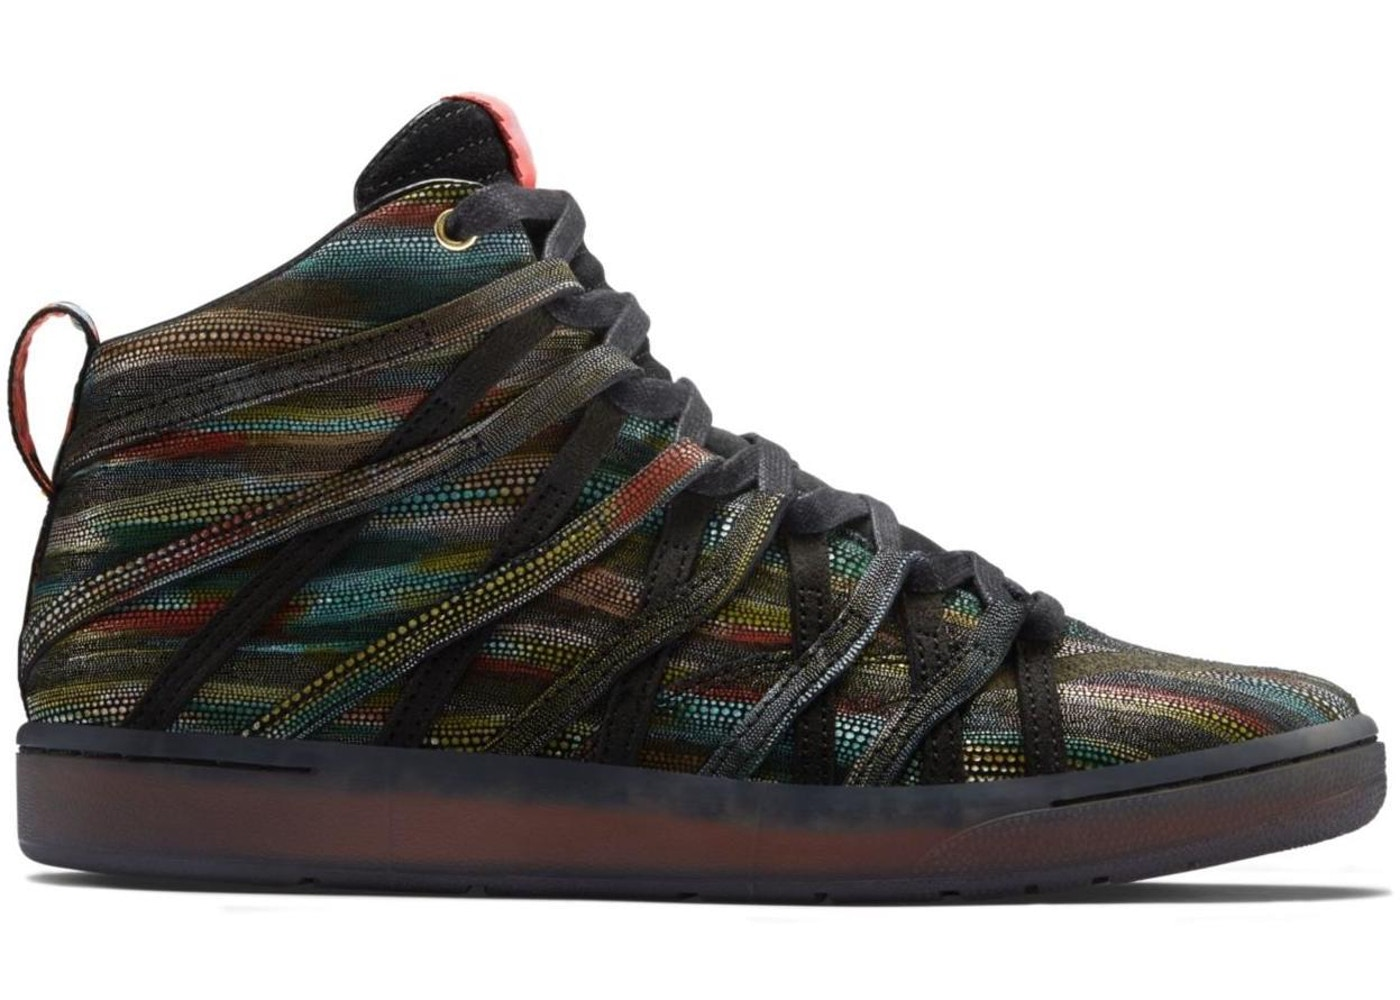 ac7d472cf32f Nike KD 7 Shoes - Volatility